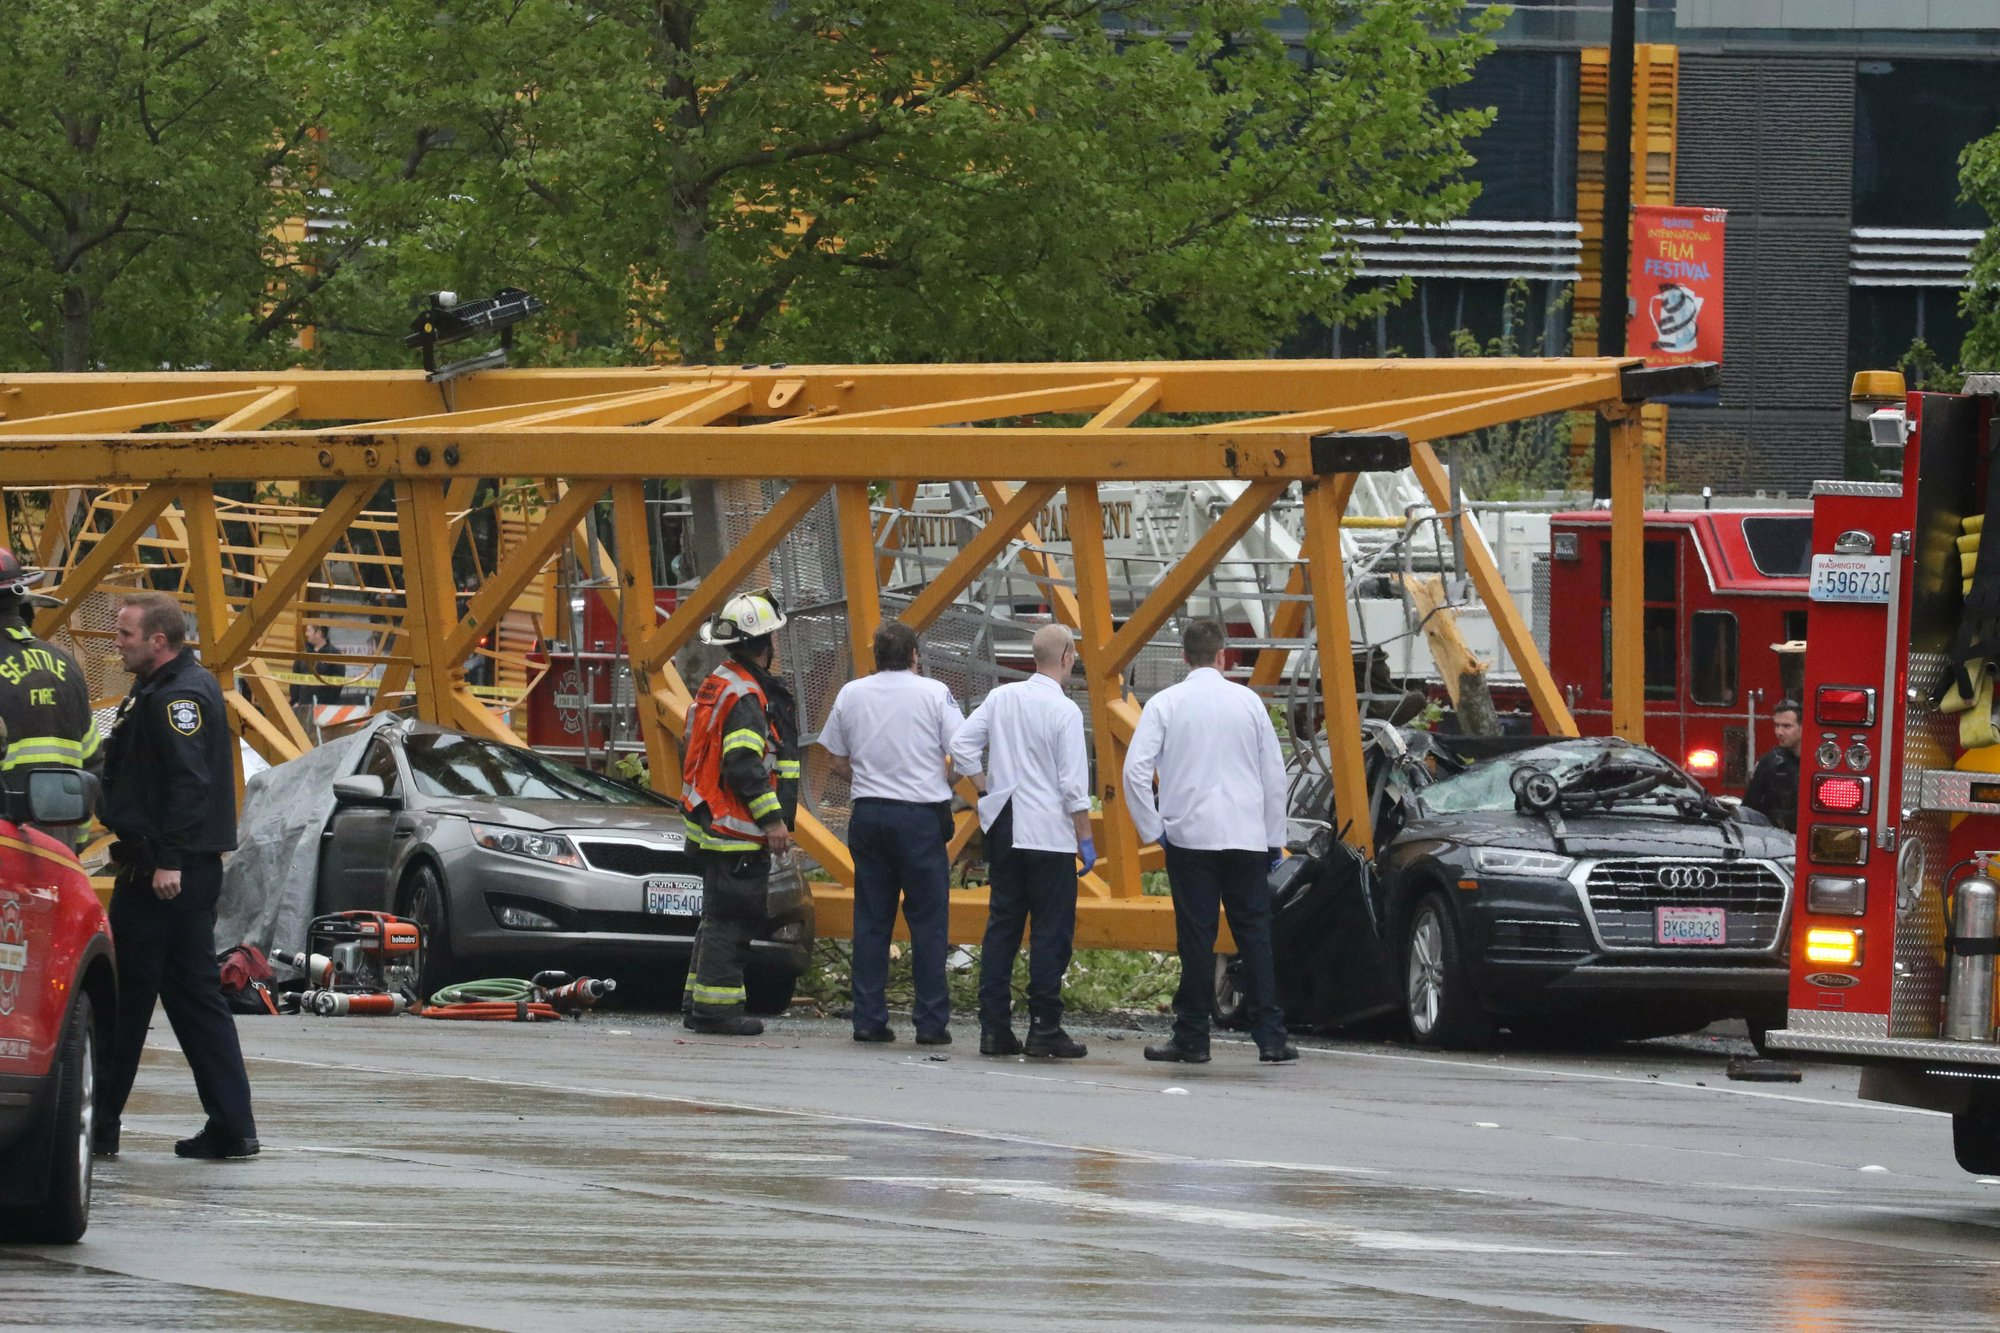 seattle crane crash_1556413305136.jpeg.jpg